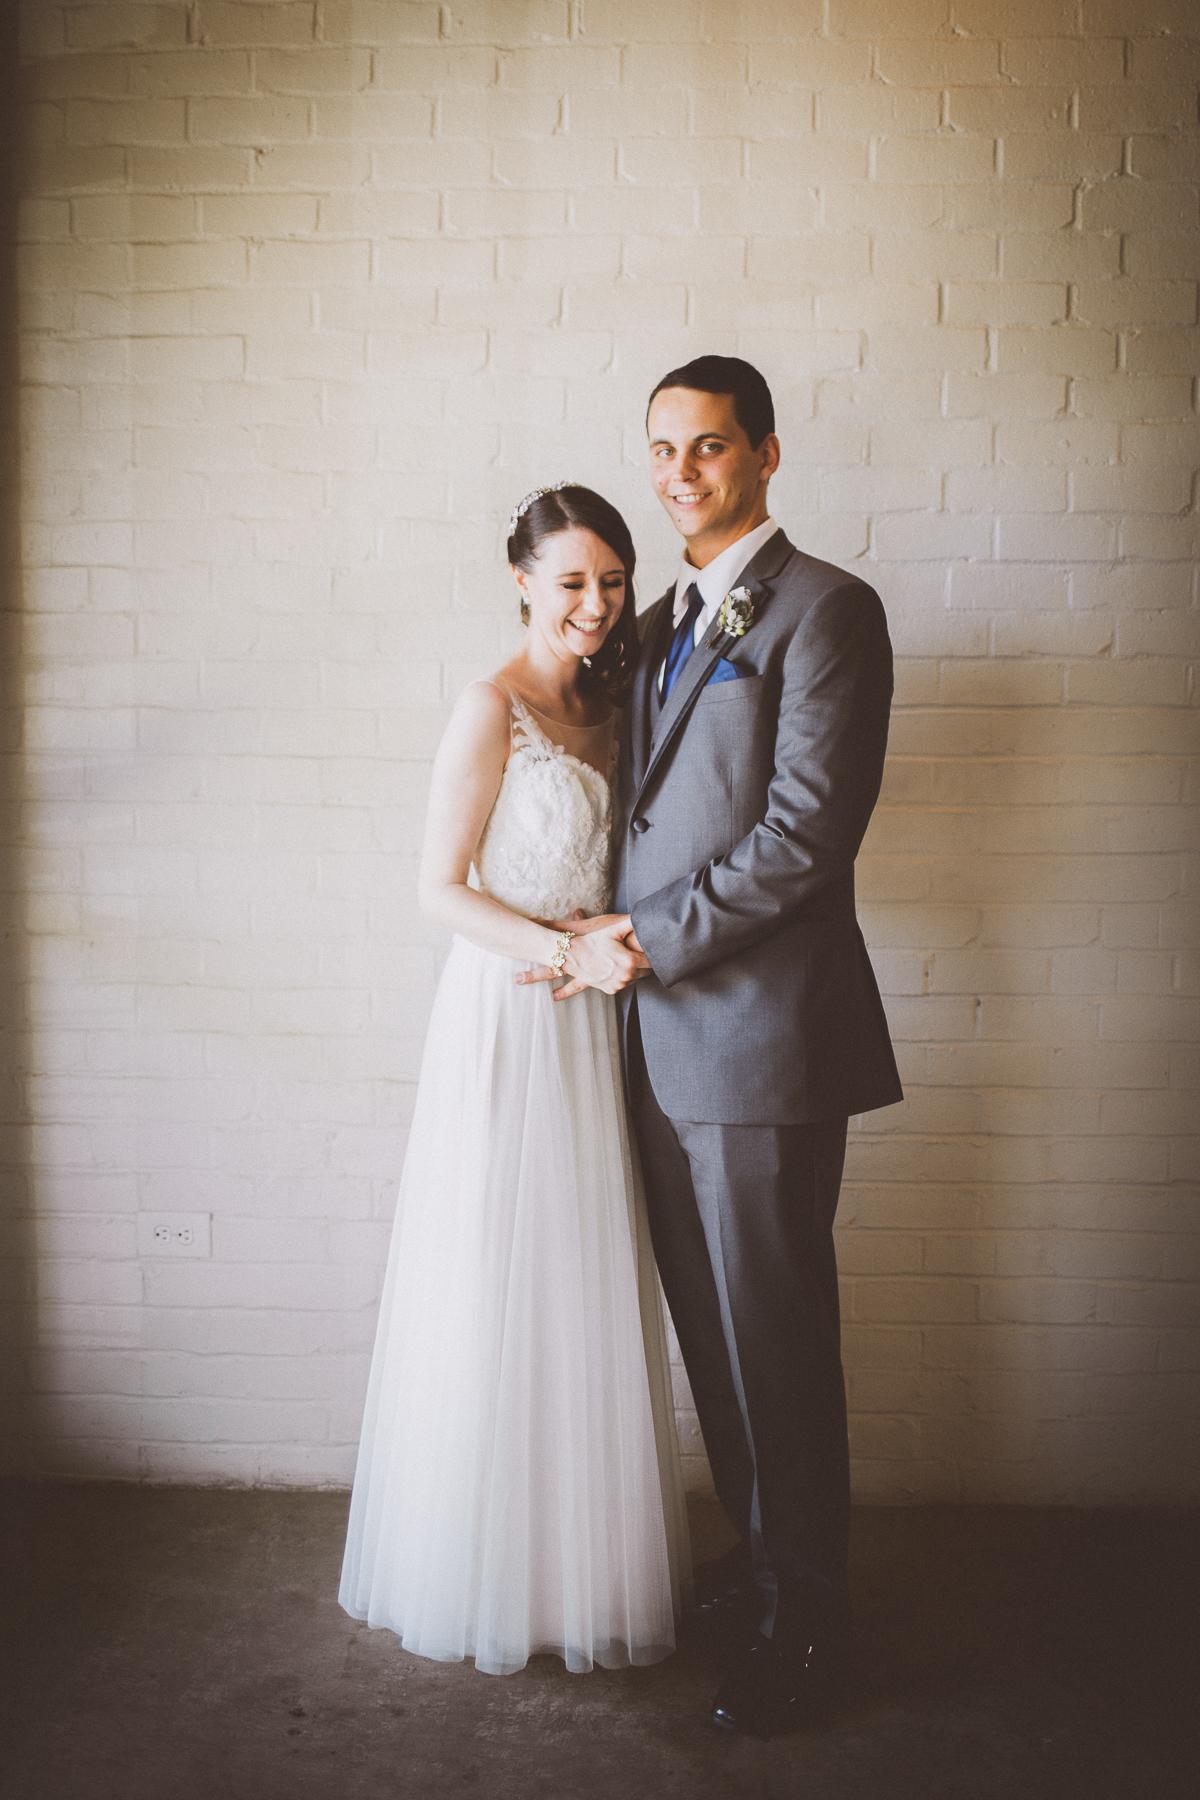 katie-pat-kelley-raye-atlanta-wedding-photographer-44.jpg